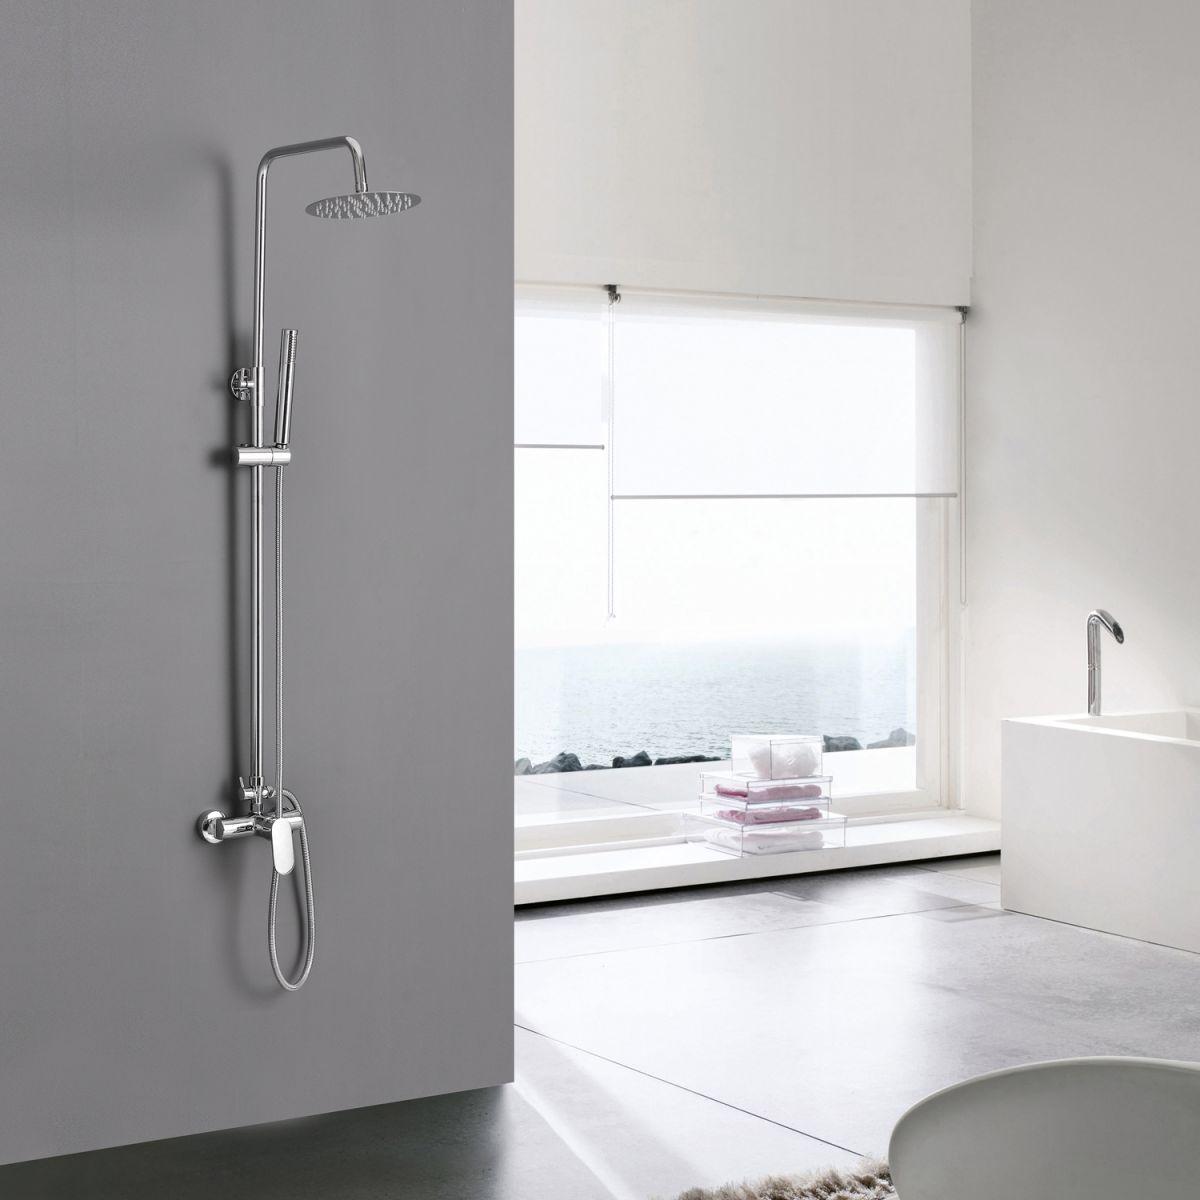 SS 06 1 Colonna doccia